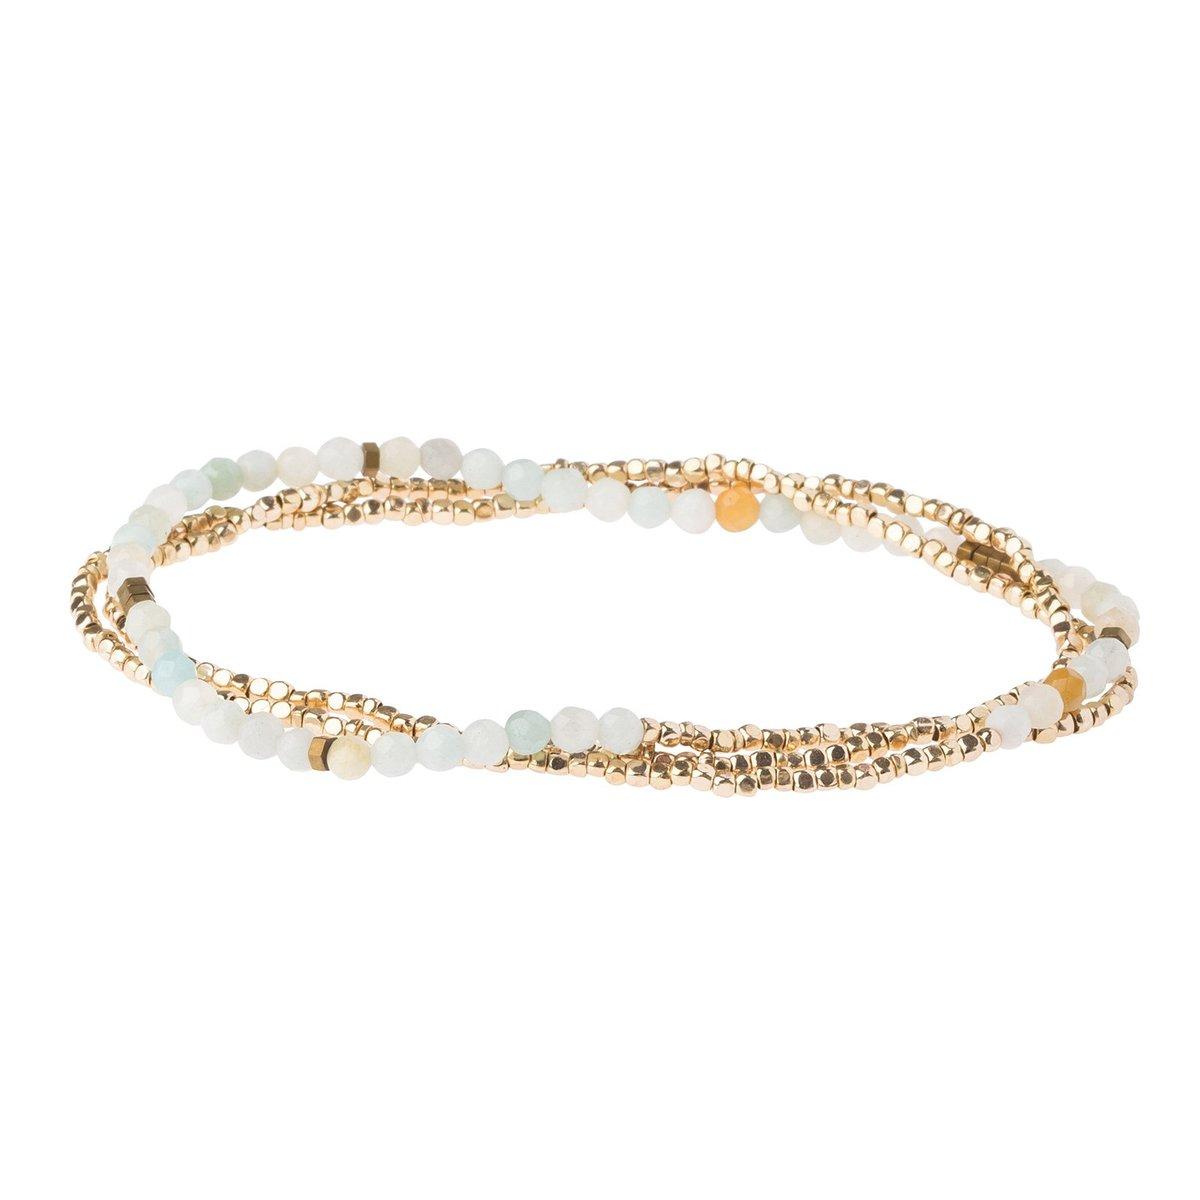 Image of Delicate Amazonite Wrap Bracelet/Necklace